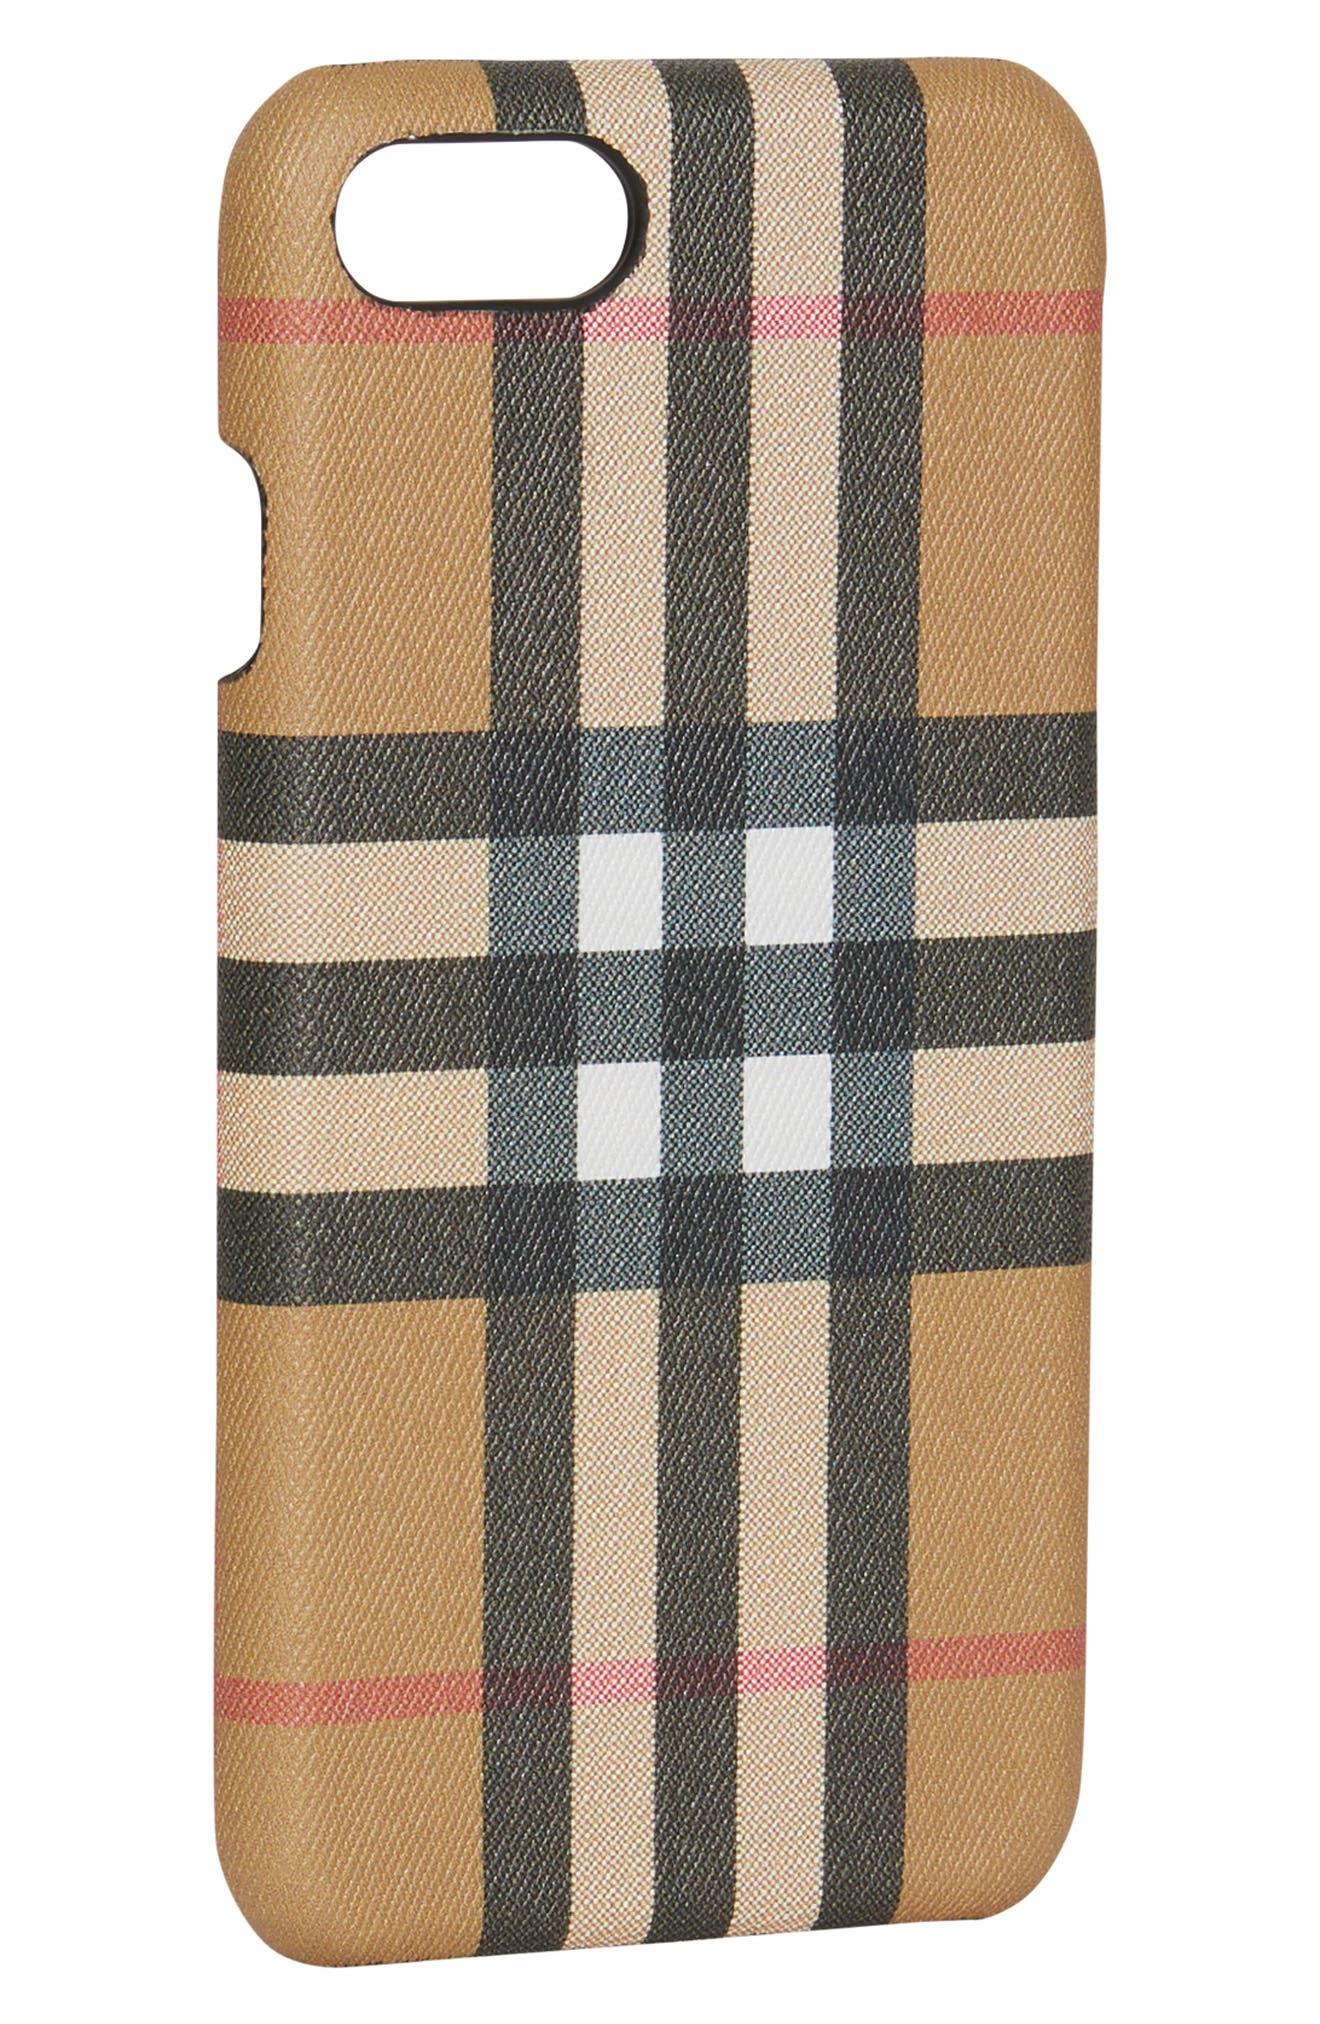 Vintage Check iPhone 8 Case,                             Alternate thumbnail 4, color,                             001